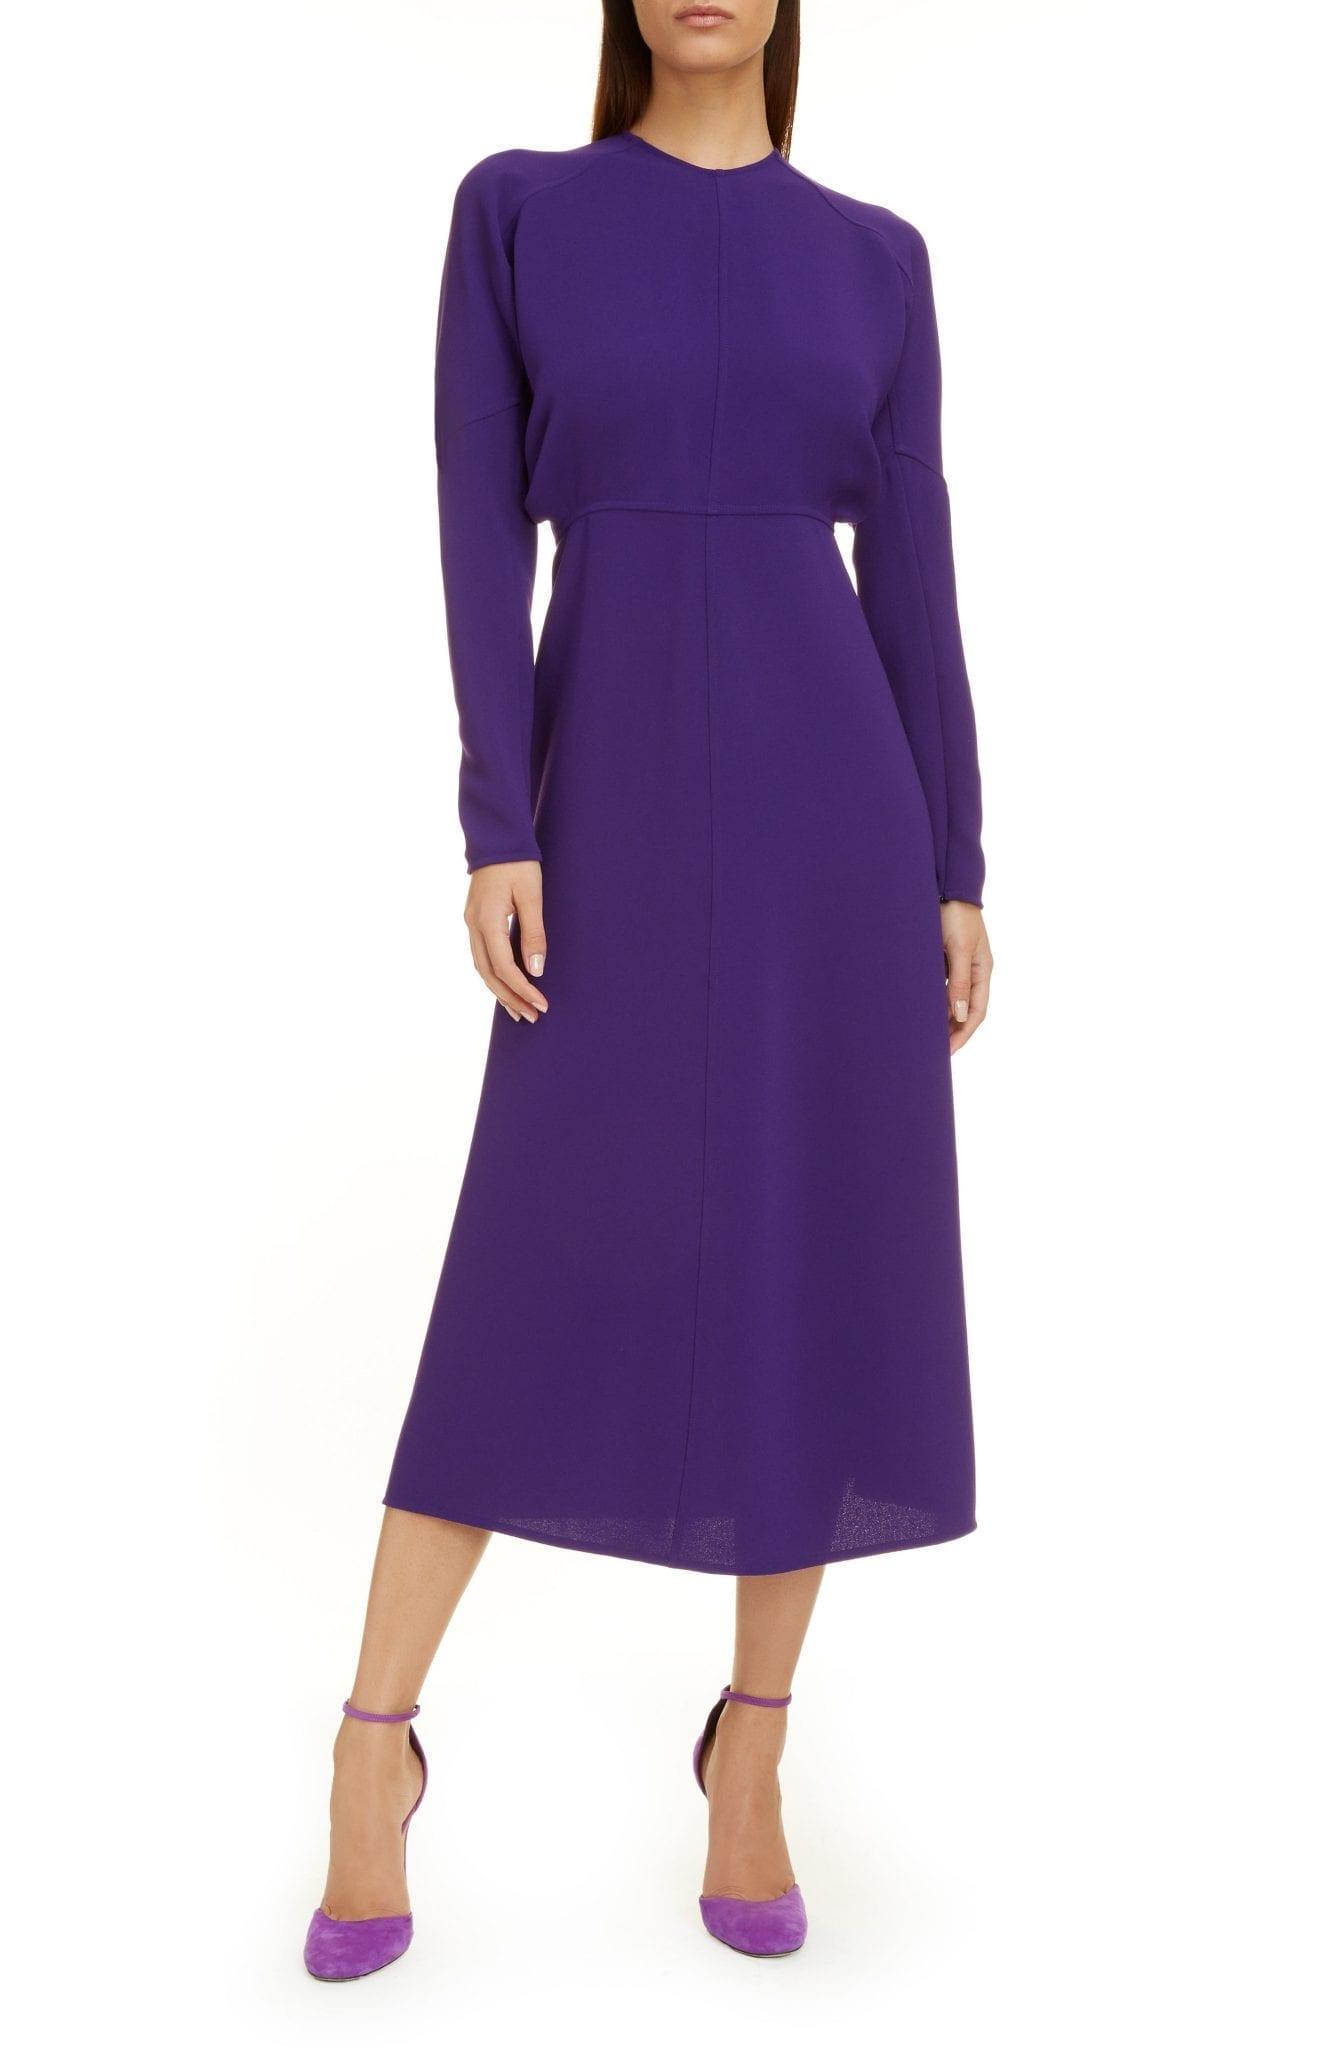 VICTORIA BECKHAM Dolman Long Sleeve Midi Dress